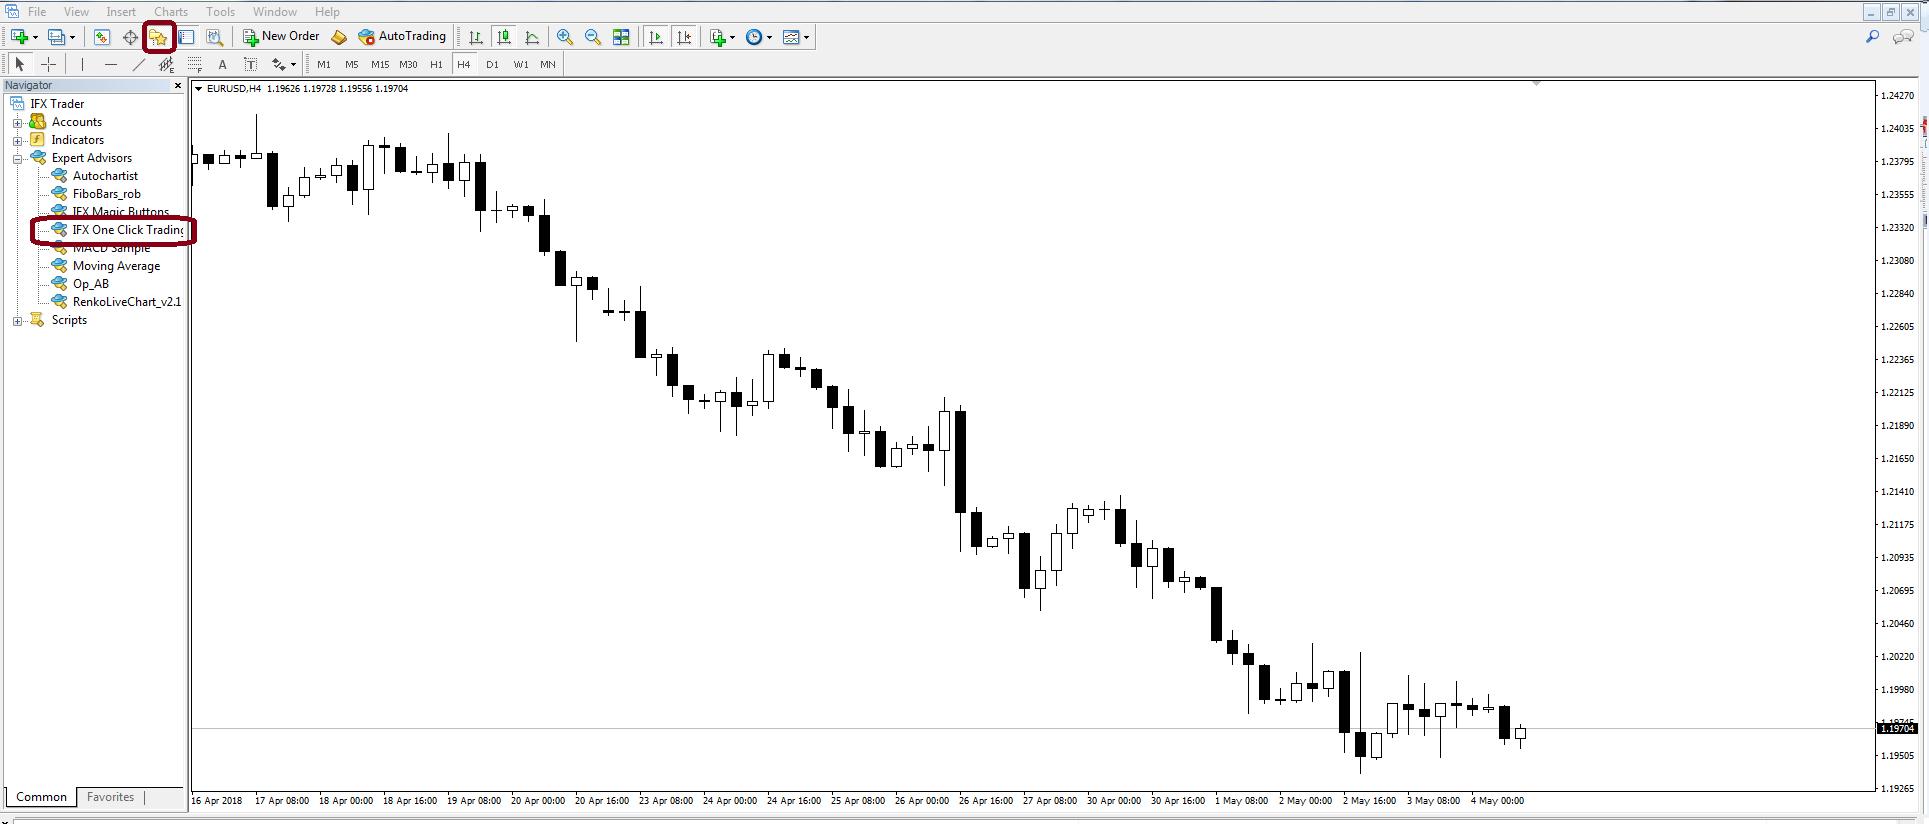 One click trading. Screenshot